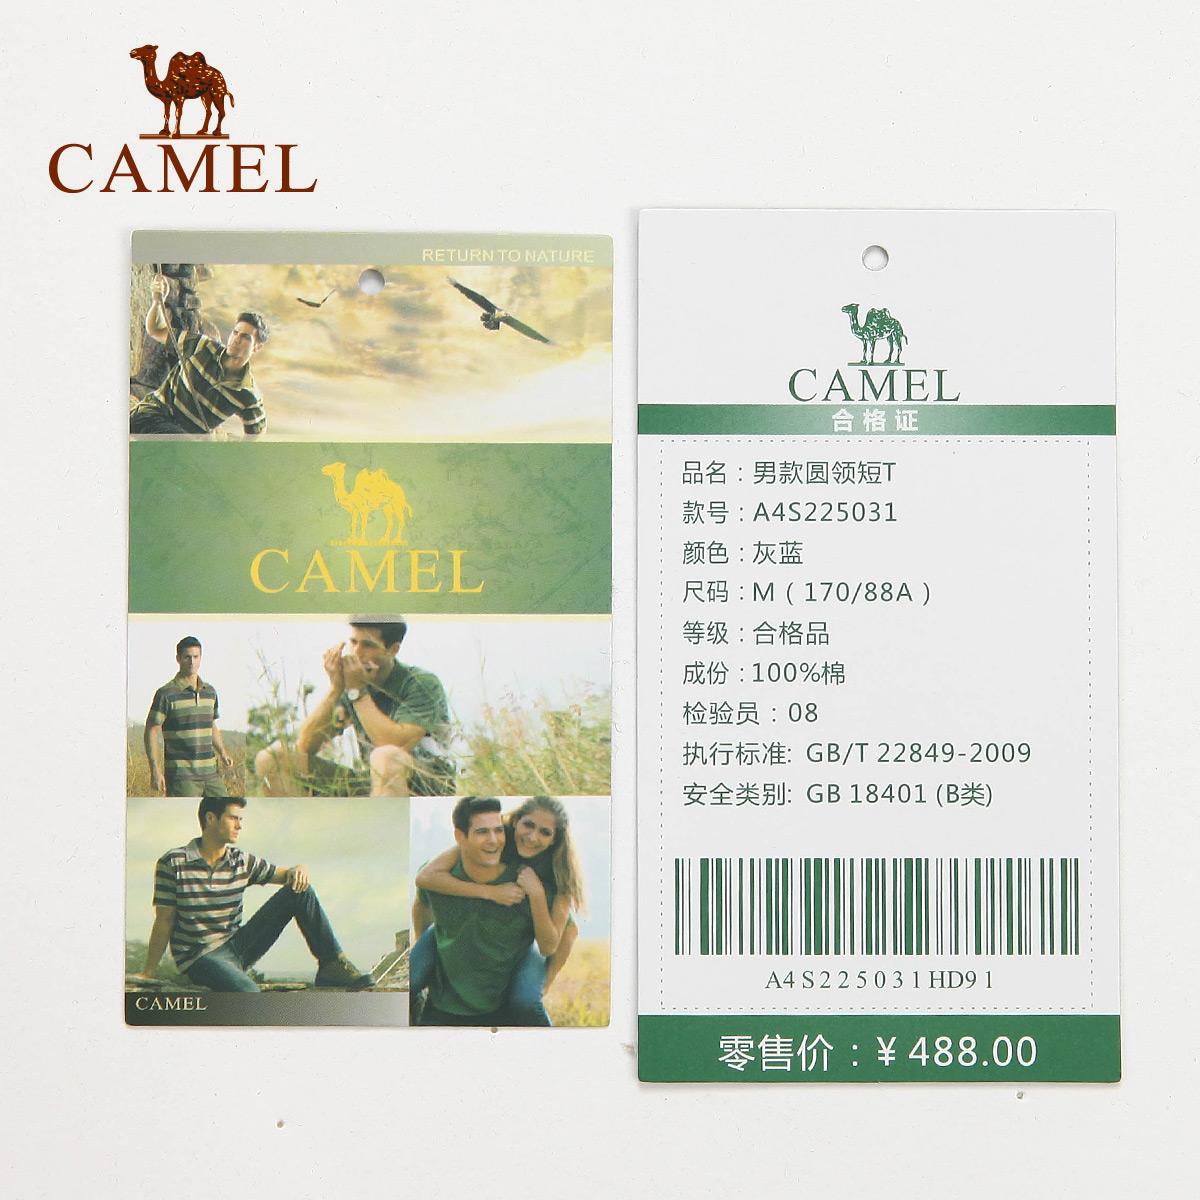 Футболка Camel a4s225031 2014 Camel